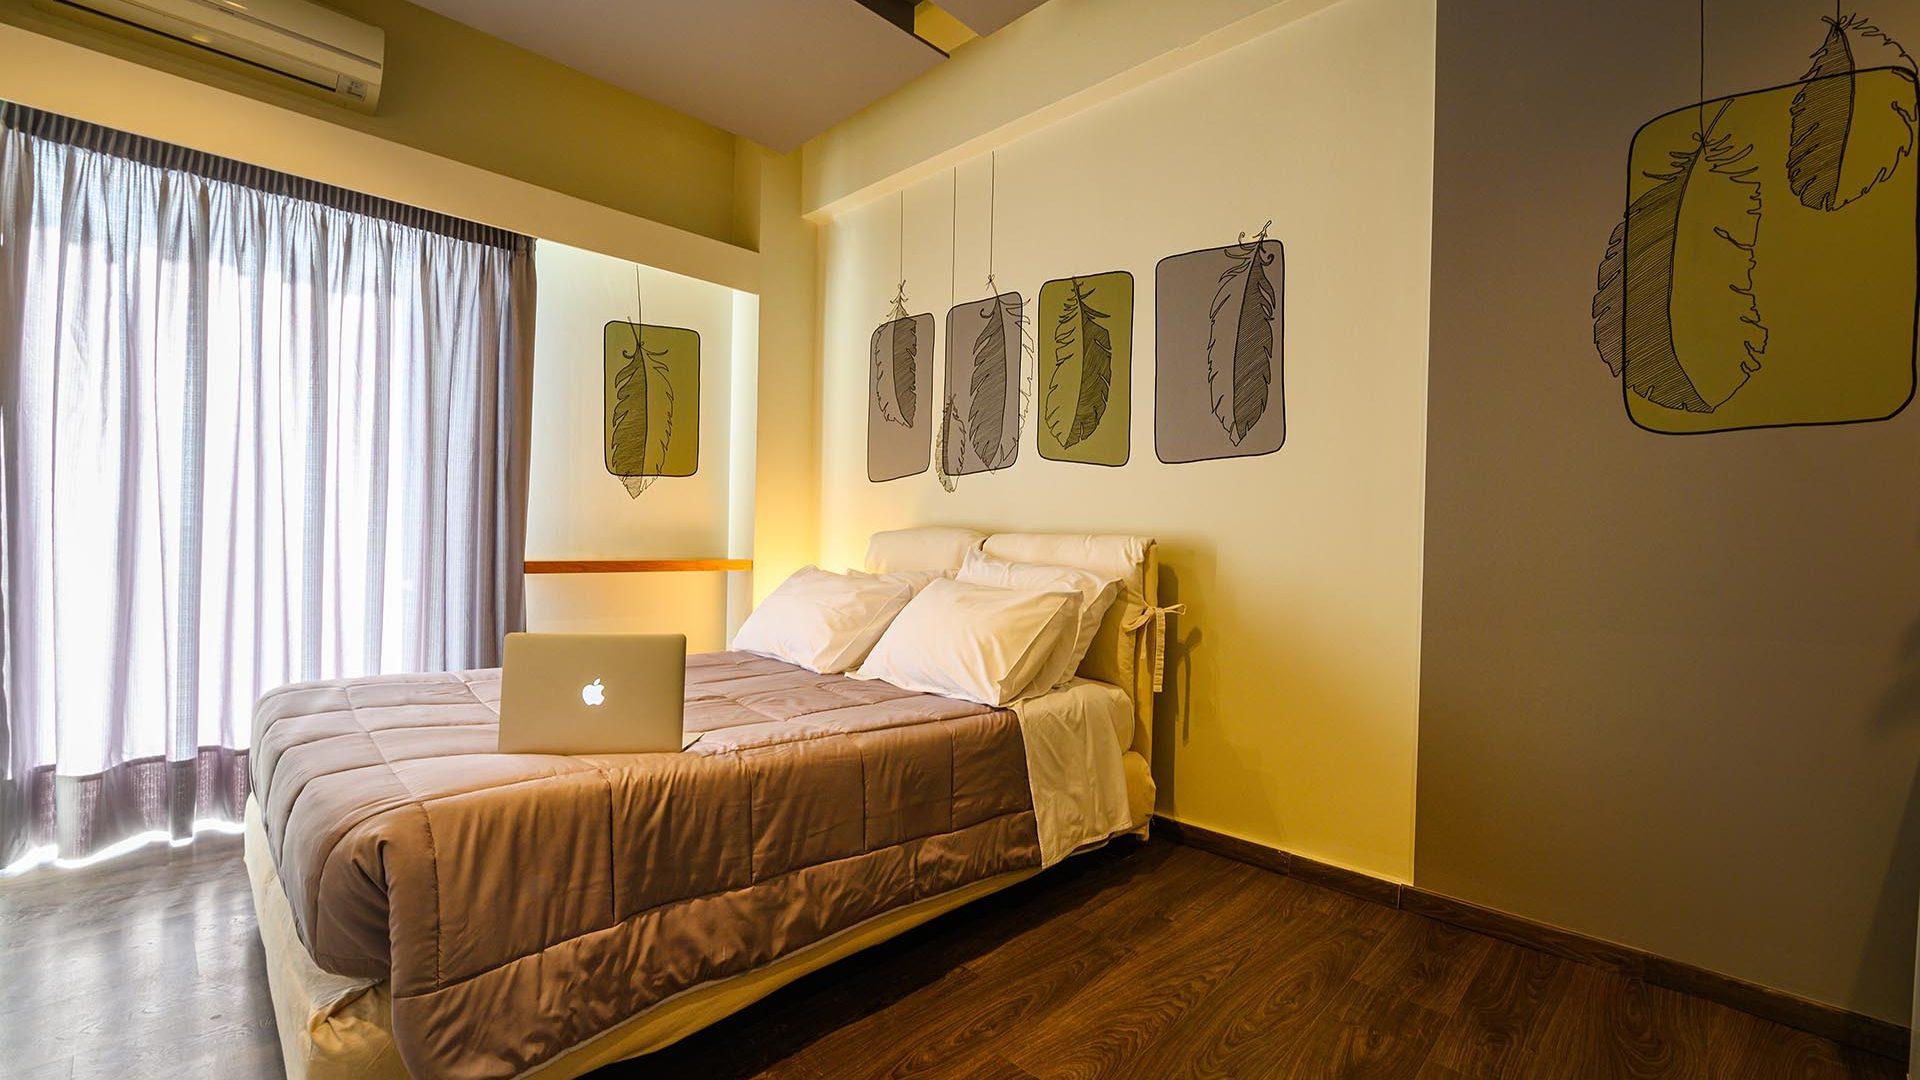 Deluxe Double Room in Messini | Kleopatra Inn Hotel